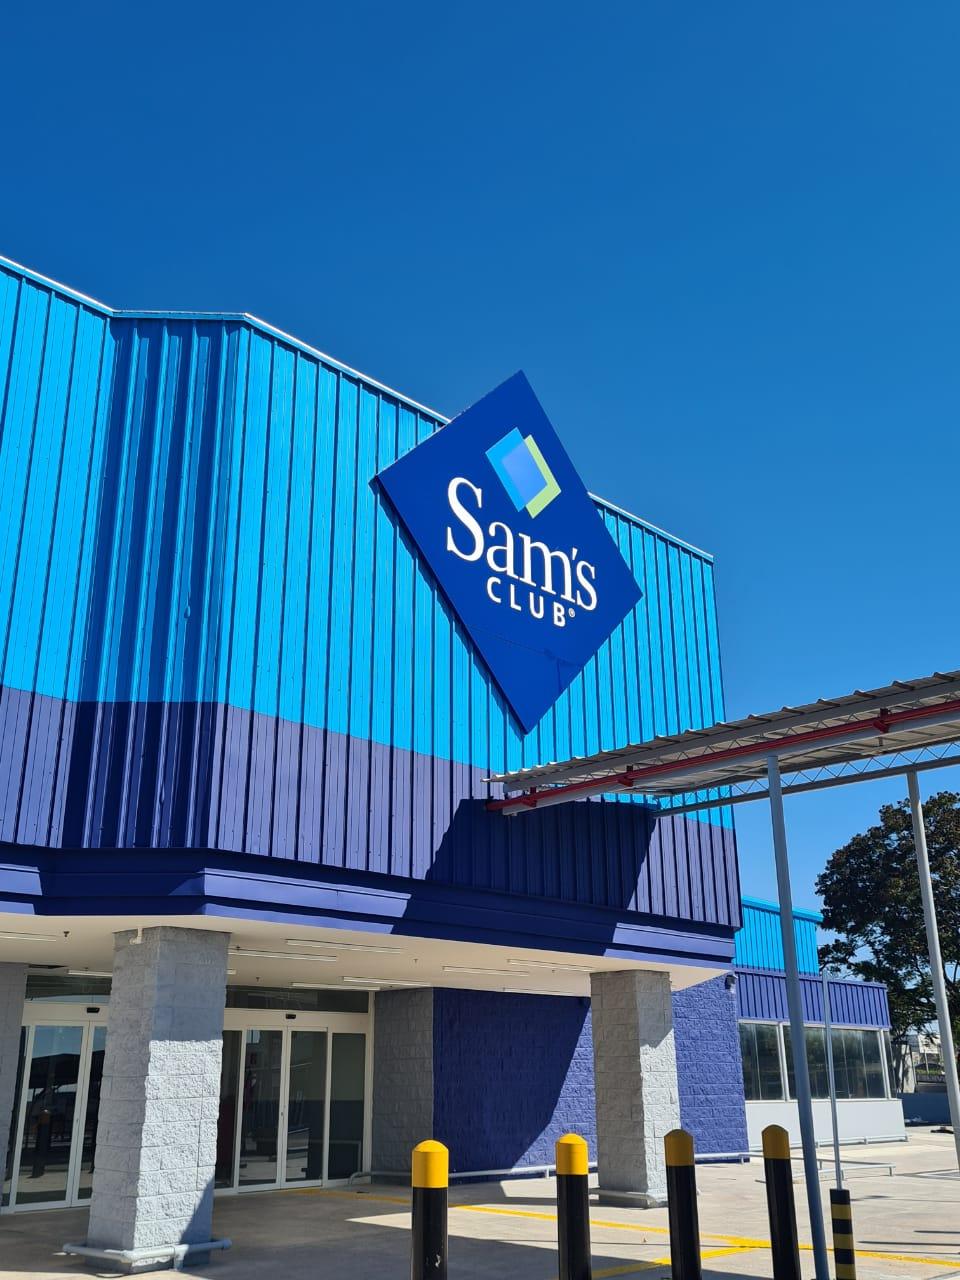 SAM'S CLUB CHEGA A BAURU